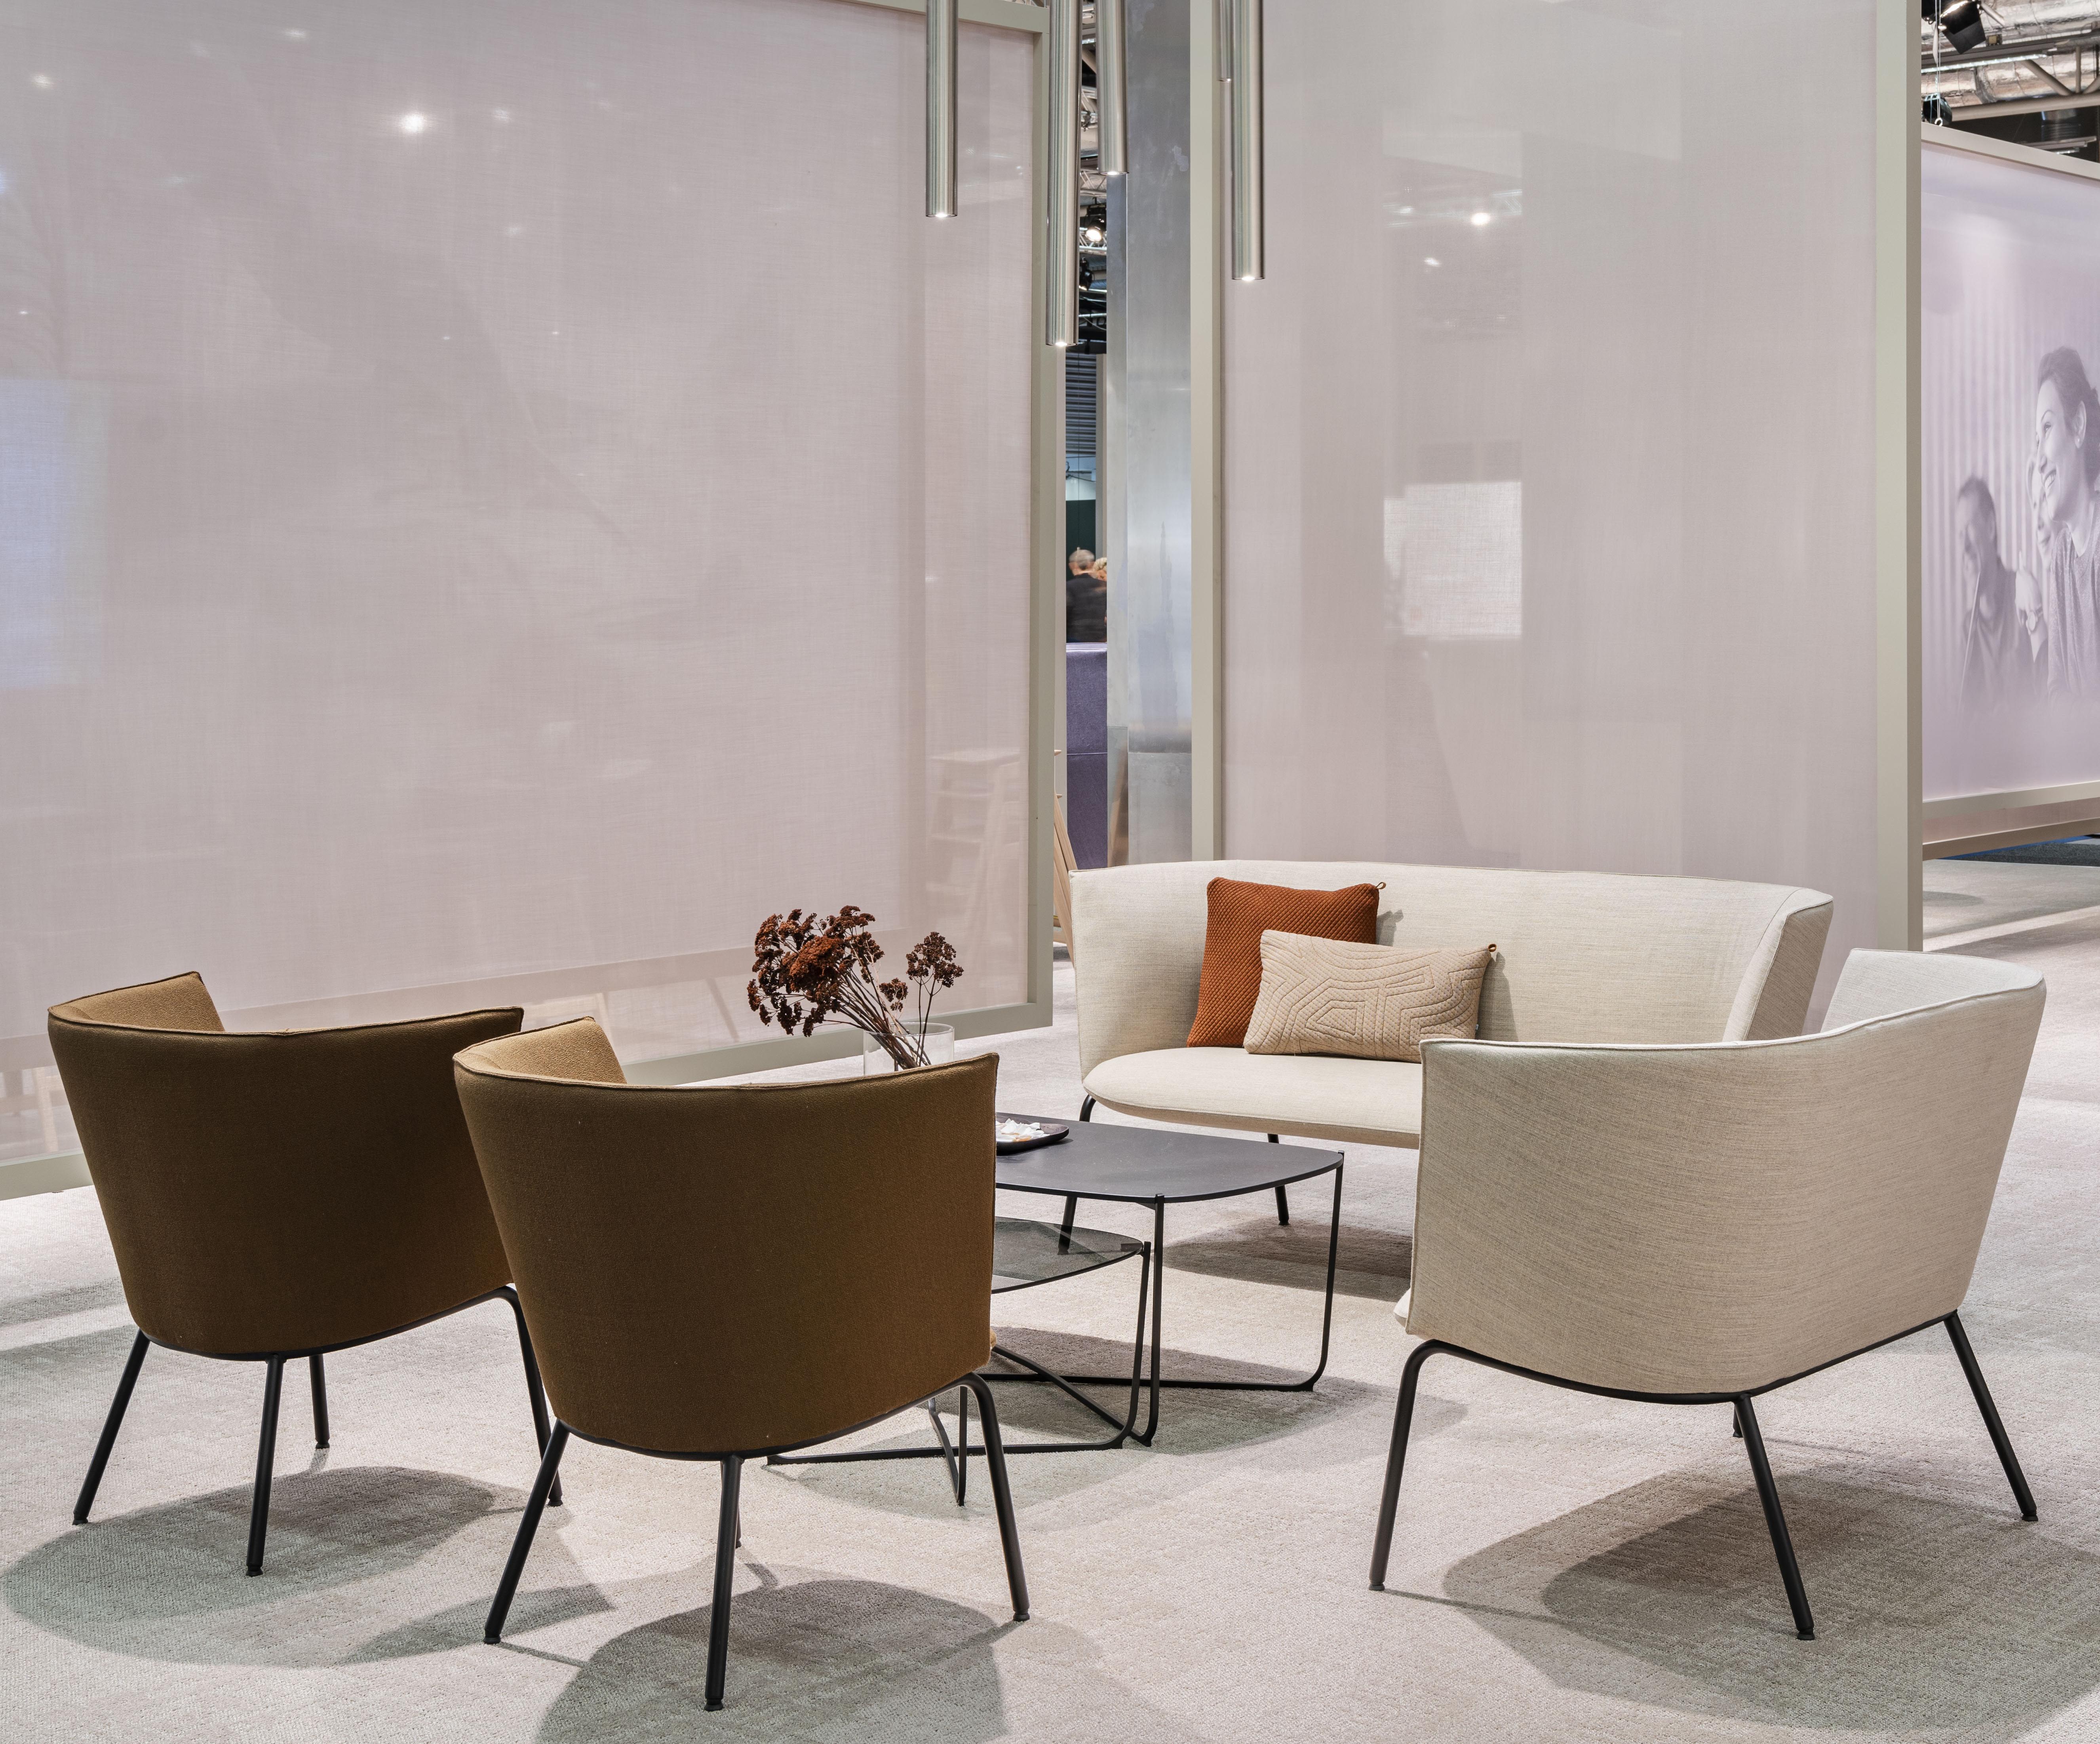 Tind sittegruppe med lav rygg og Root bord Fora Form